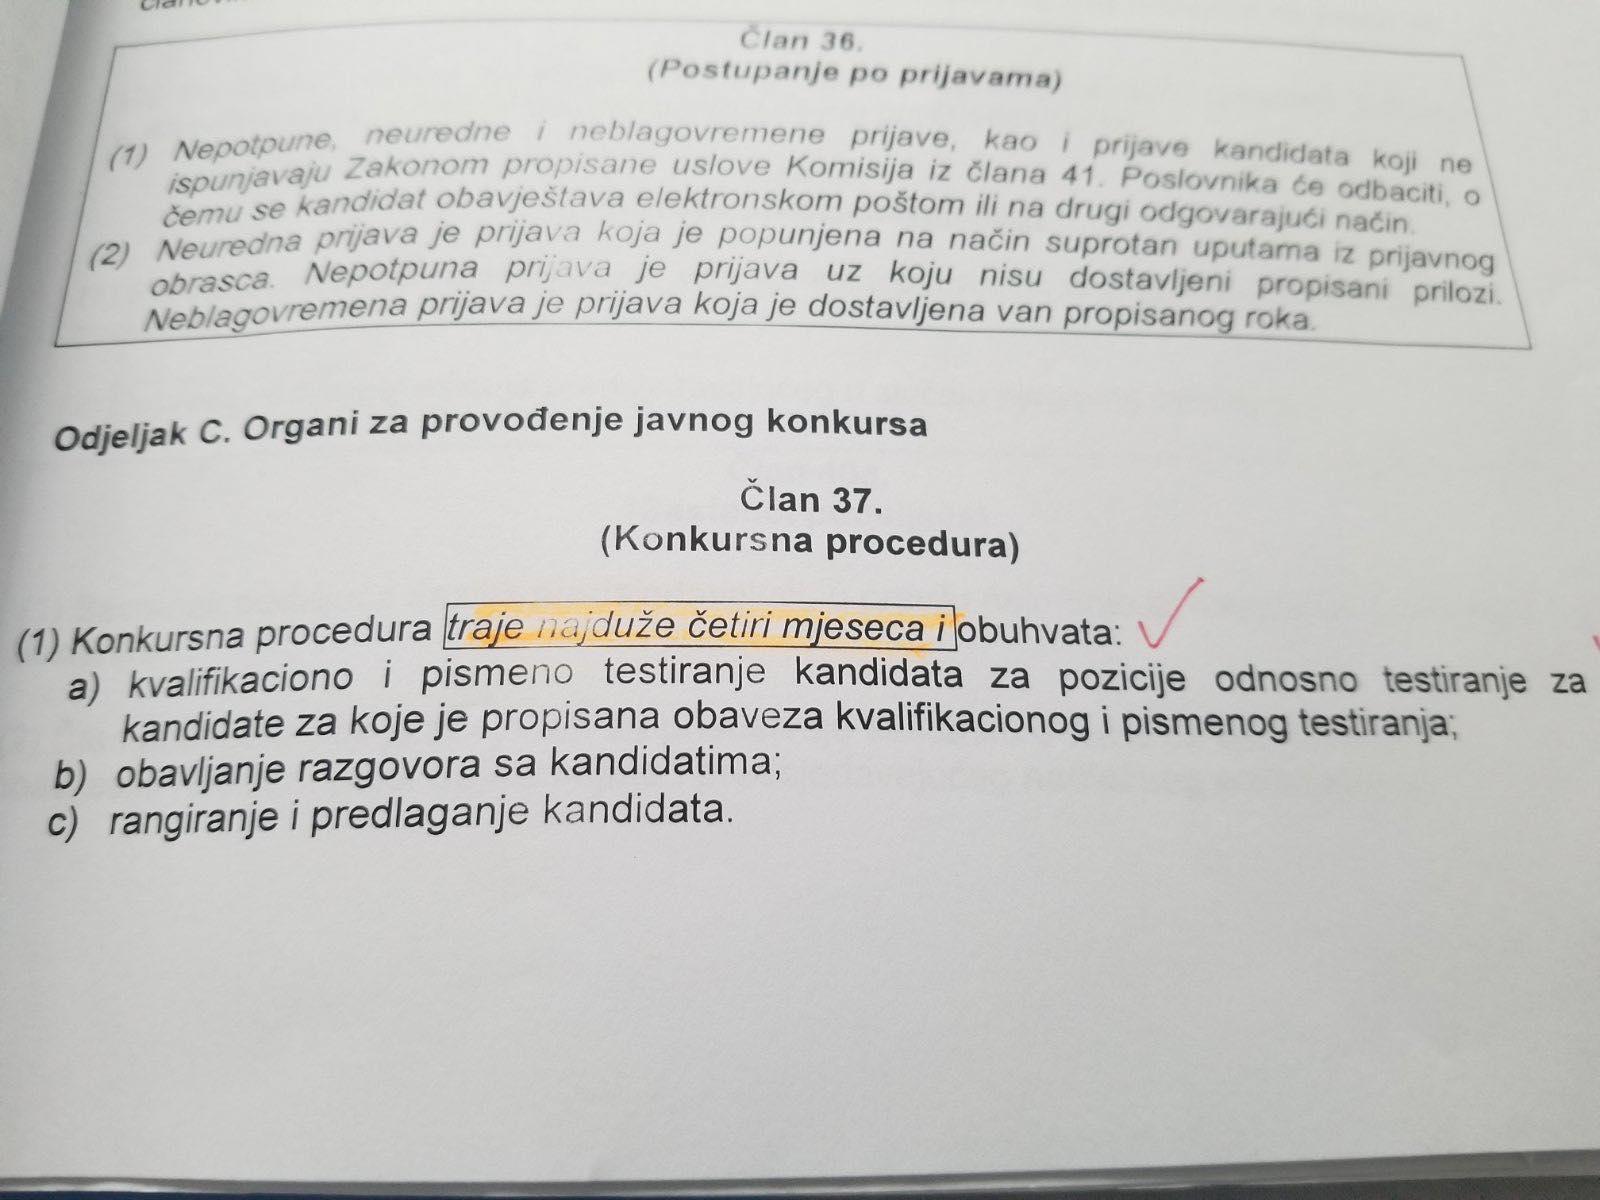 konkursna procedura